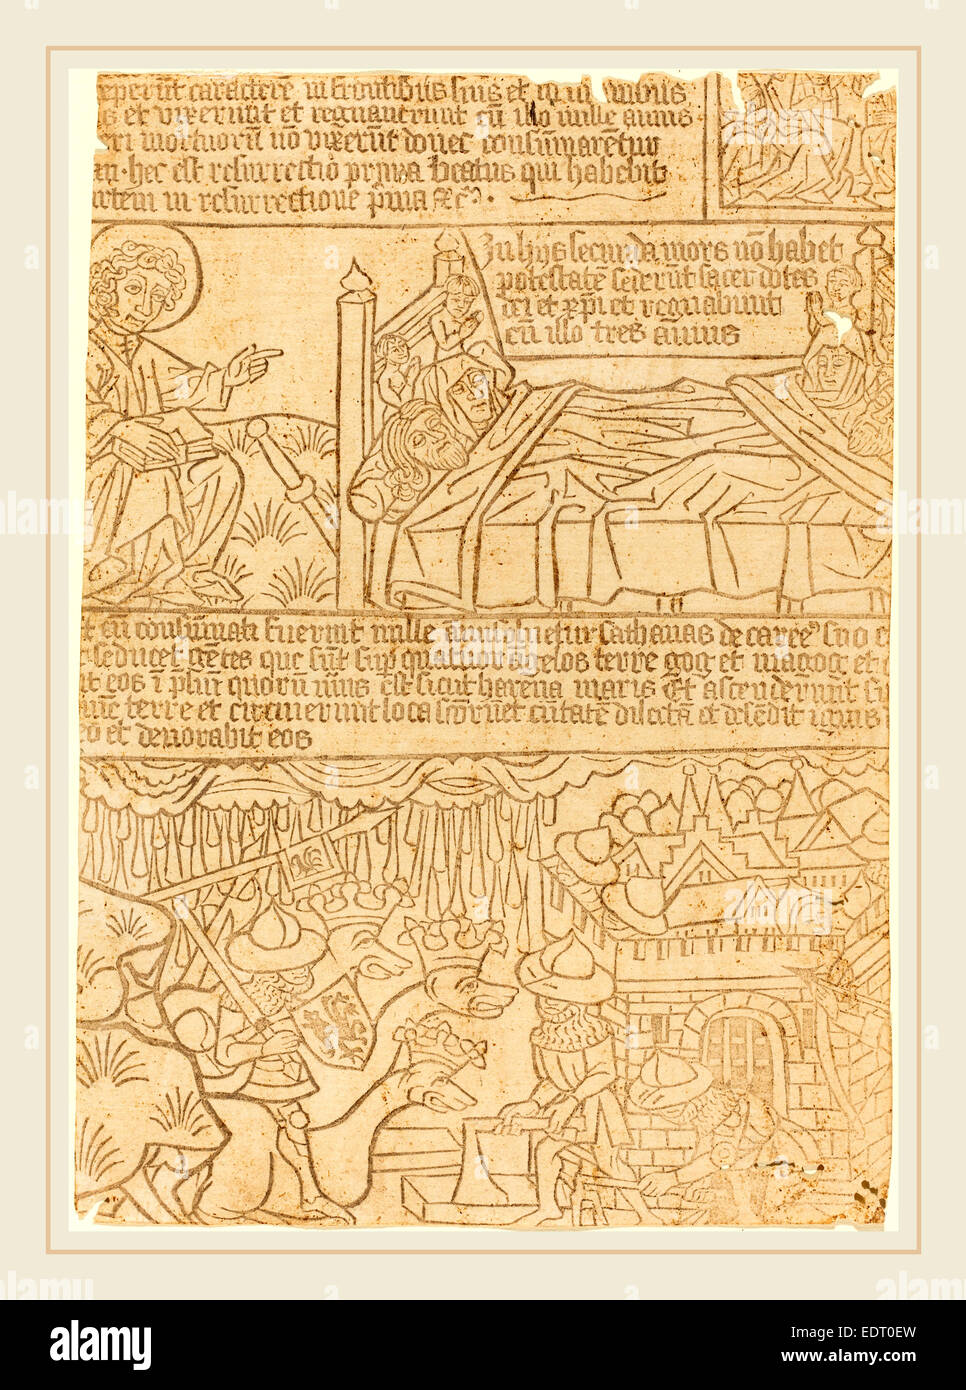 German 15th Century, Apocalypse of John, Leaf 42, c. 1465, woodcut - Stock Image